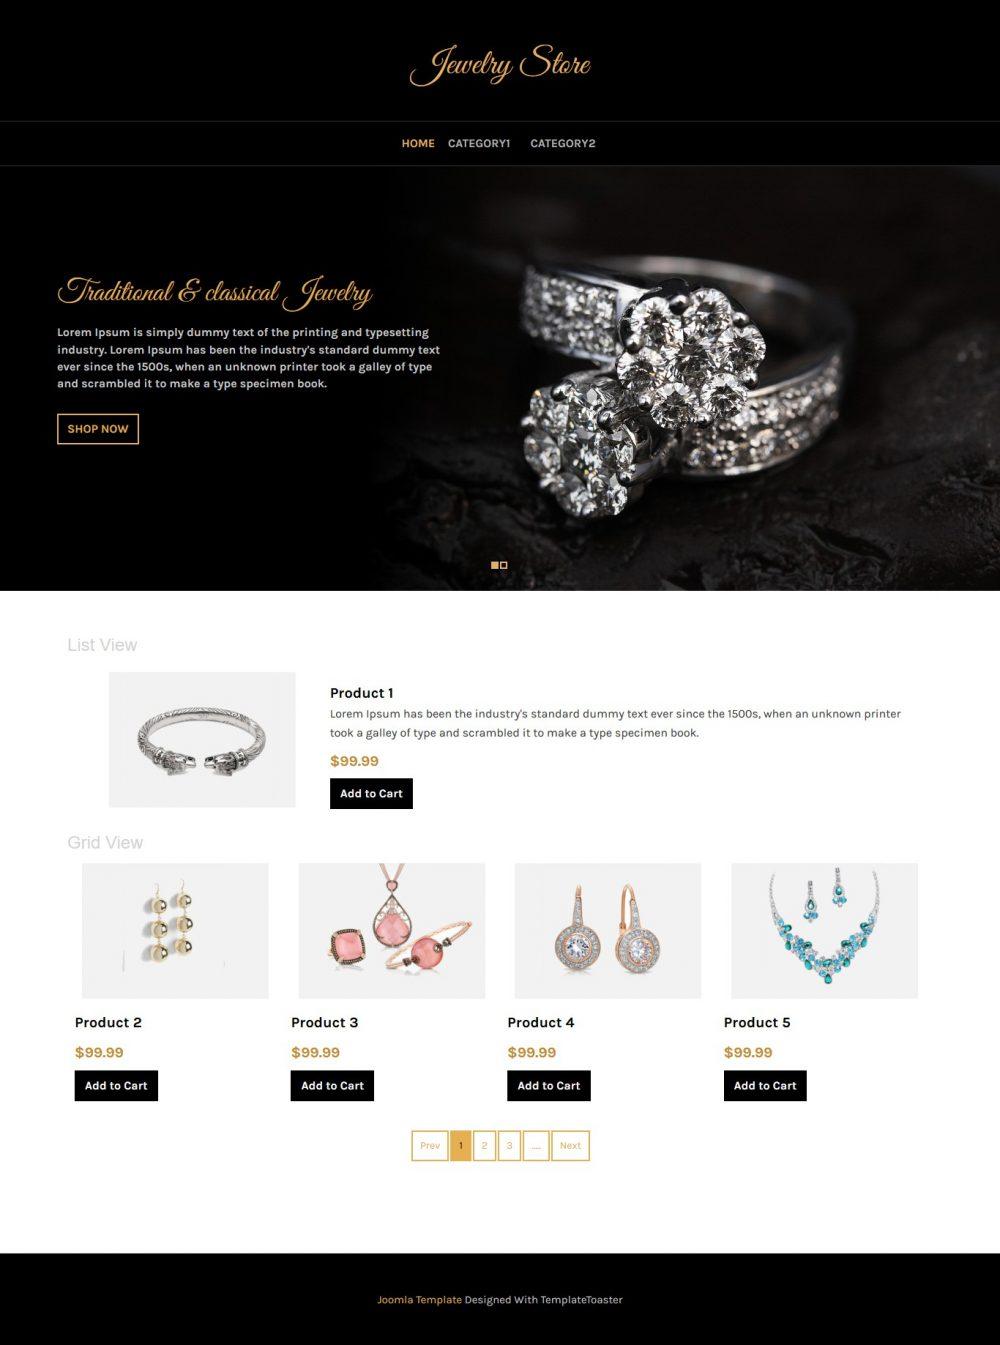 jewellery store virtuemart template